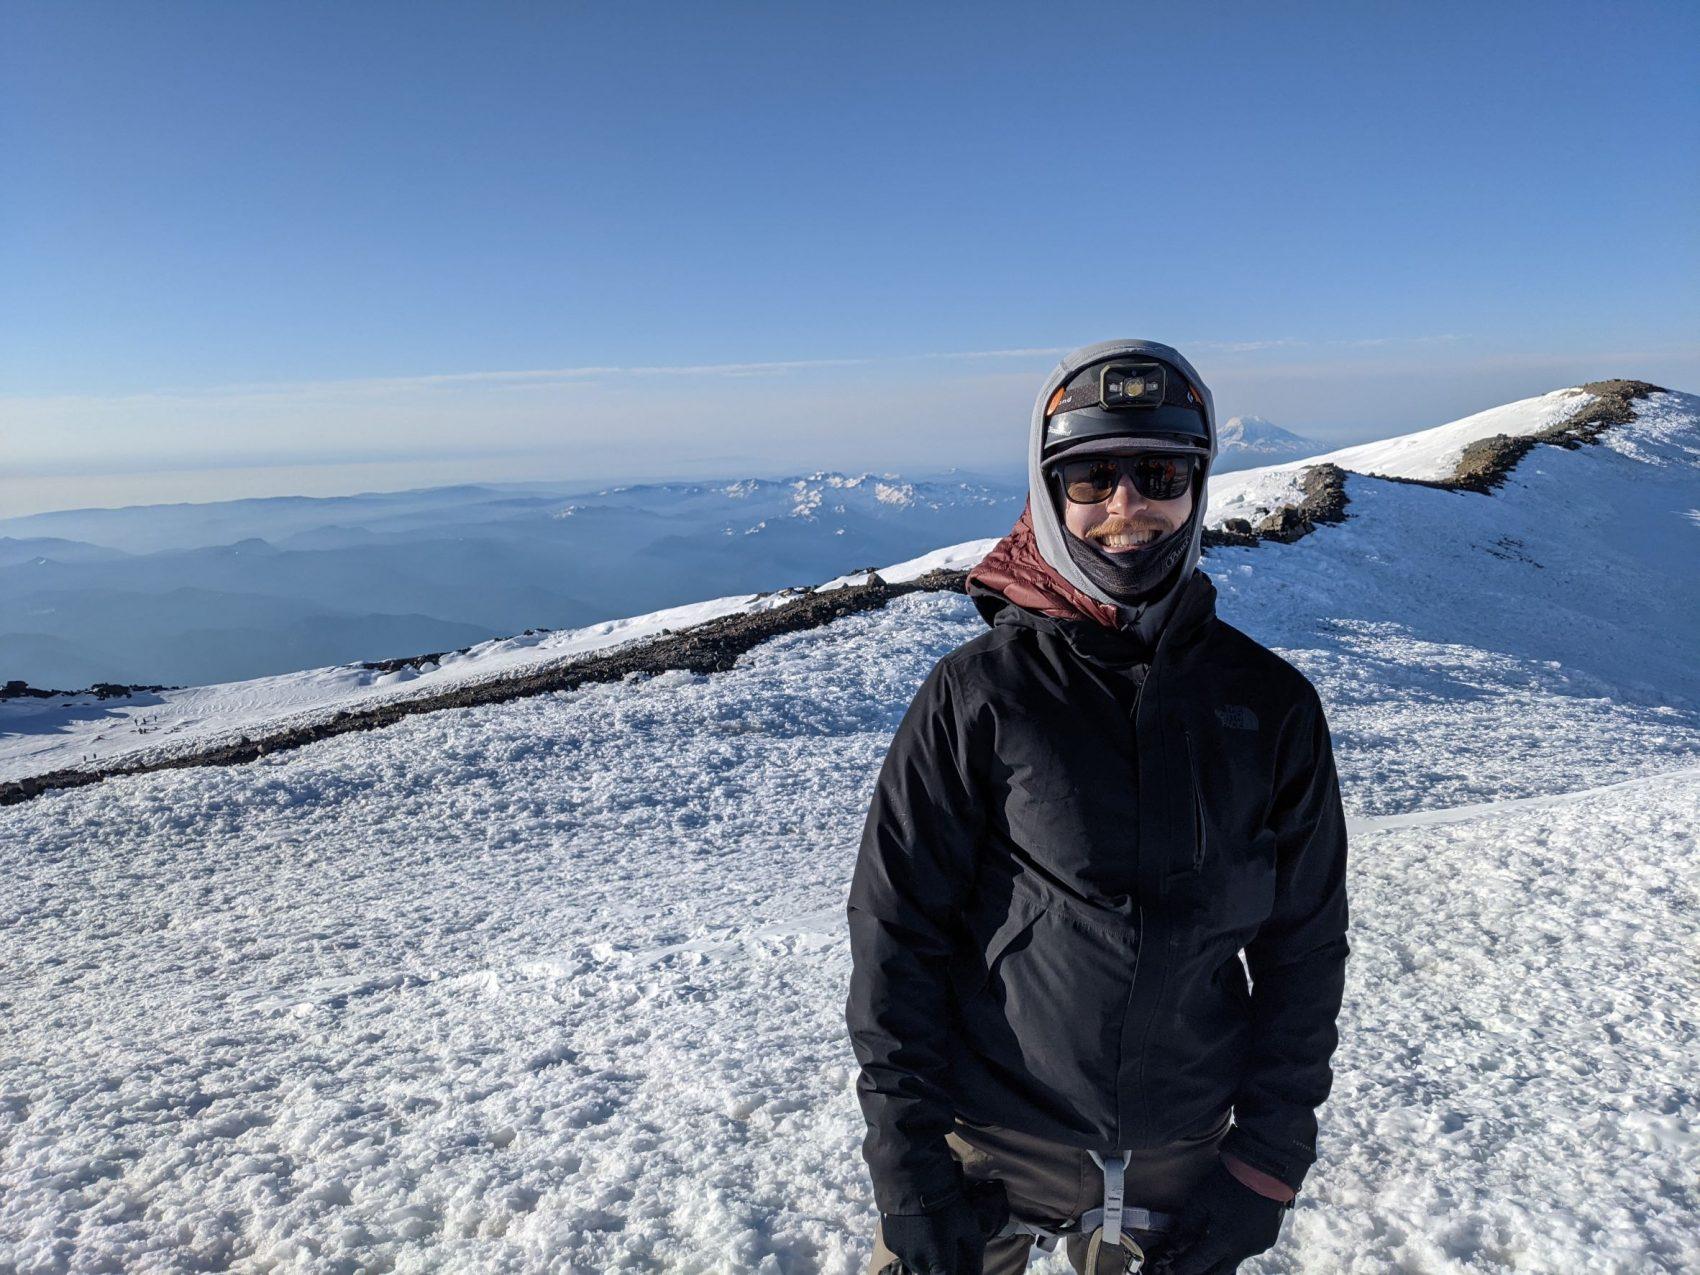 Boy on mountain top, rainier, Washington